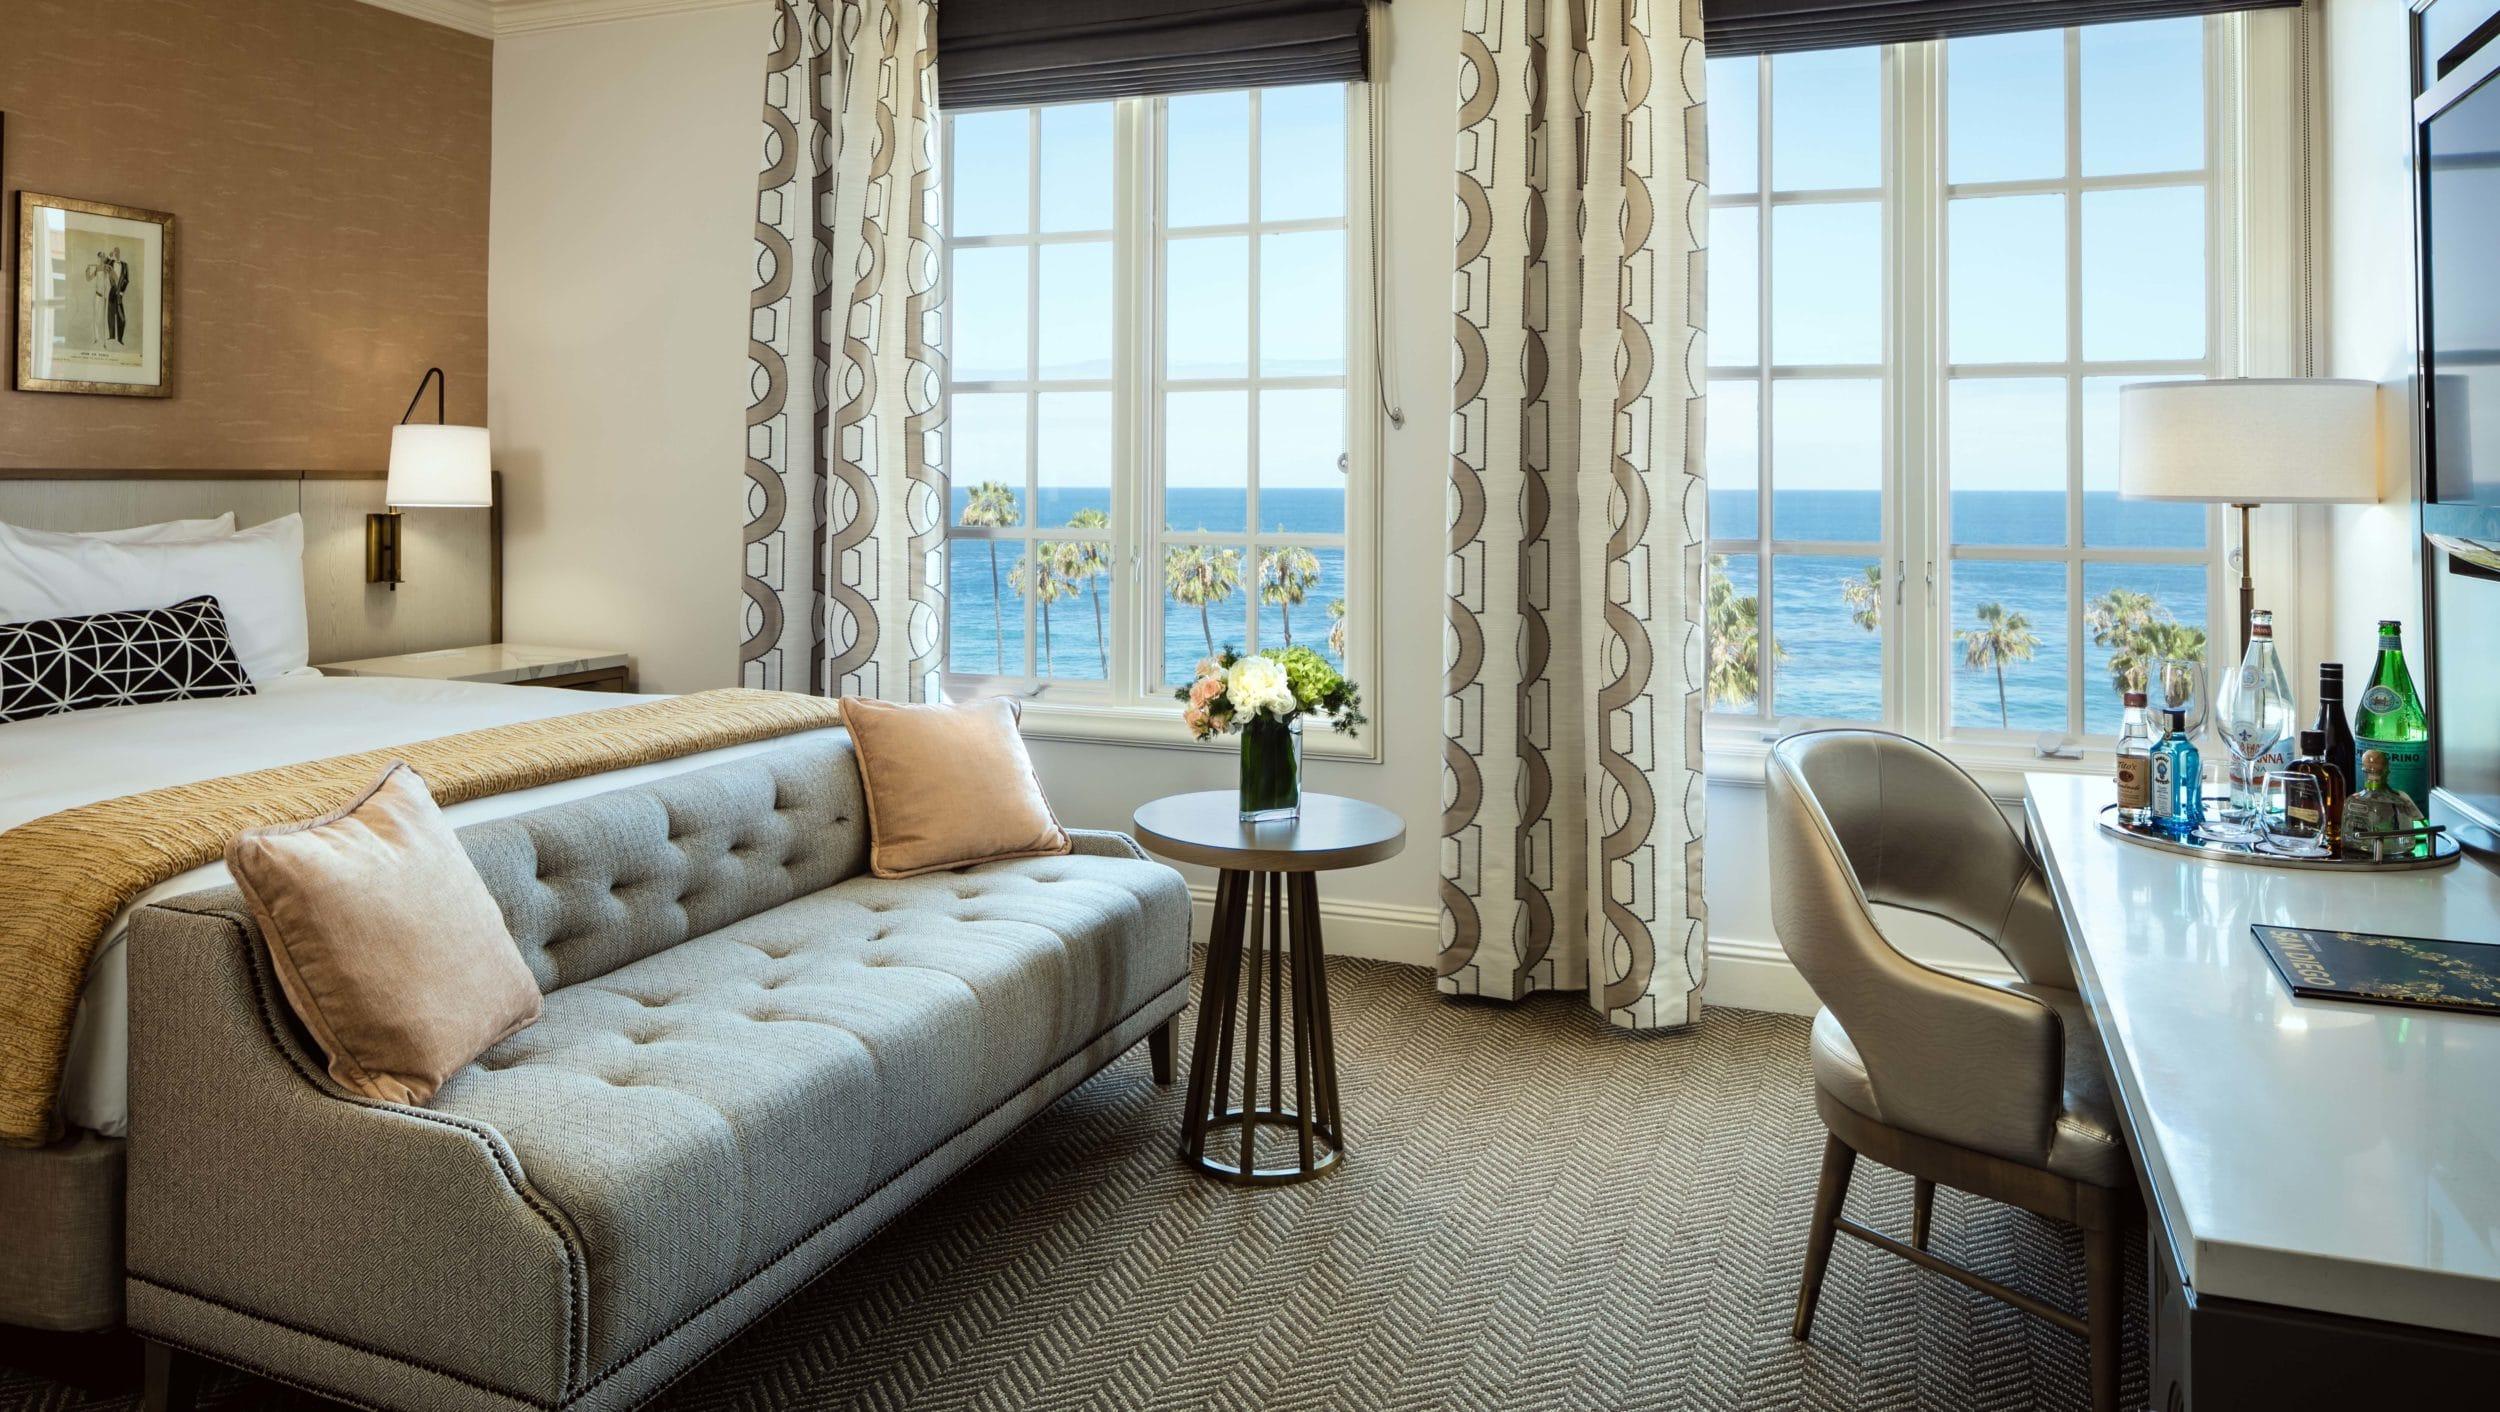 Classic King Ocean Room at La Valencia Hotel and Spa La Jolla